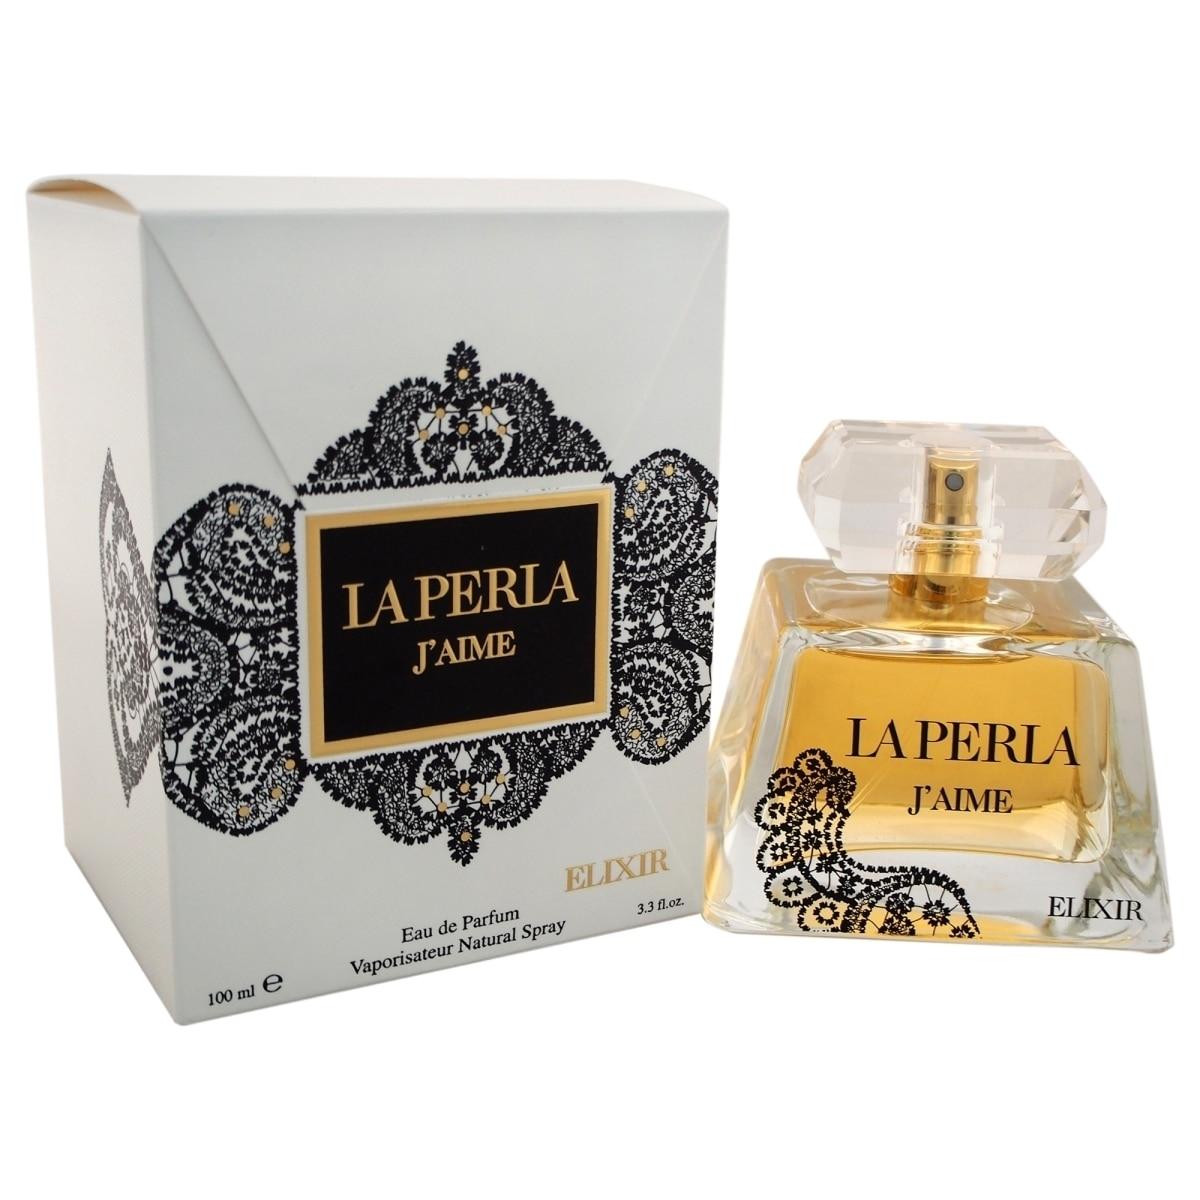 La Perla W-8351 3.3 oz Jaime Elixir EDP Spray for Women davidoff echo w edp 30